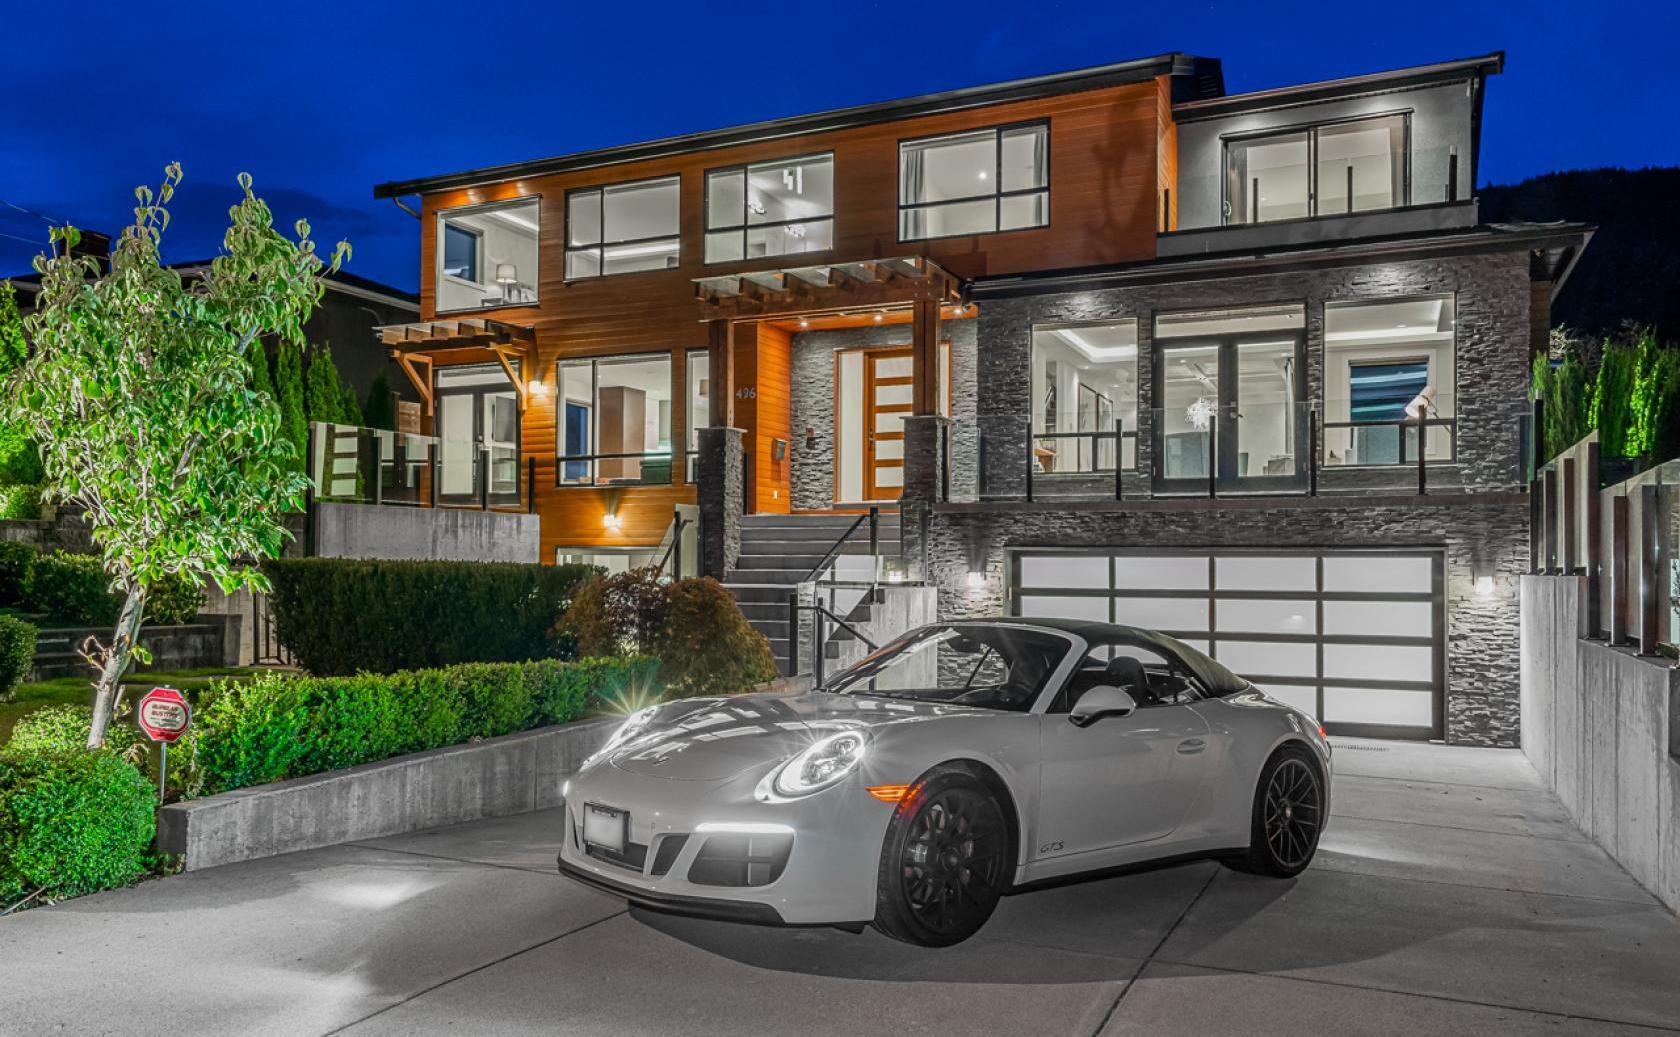 496 Saville Crescent, Upper Delbrook, North Vancouver